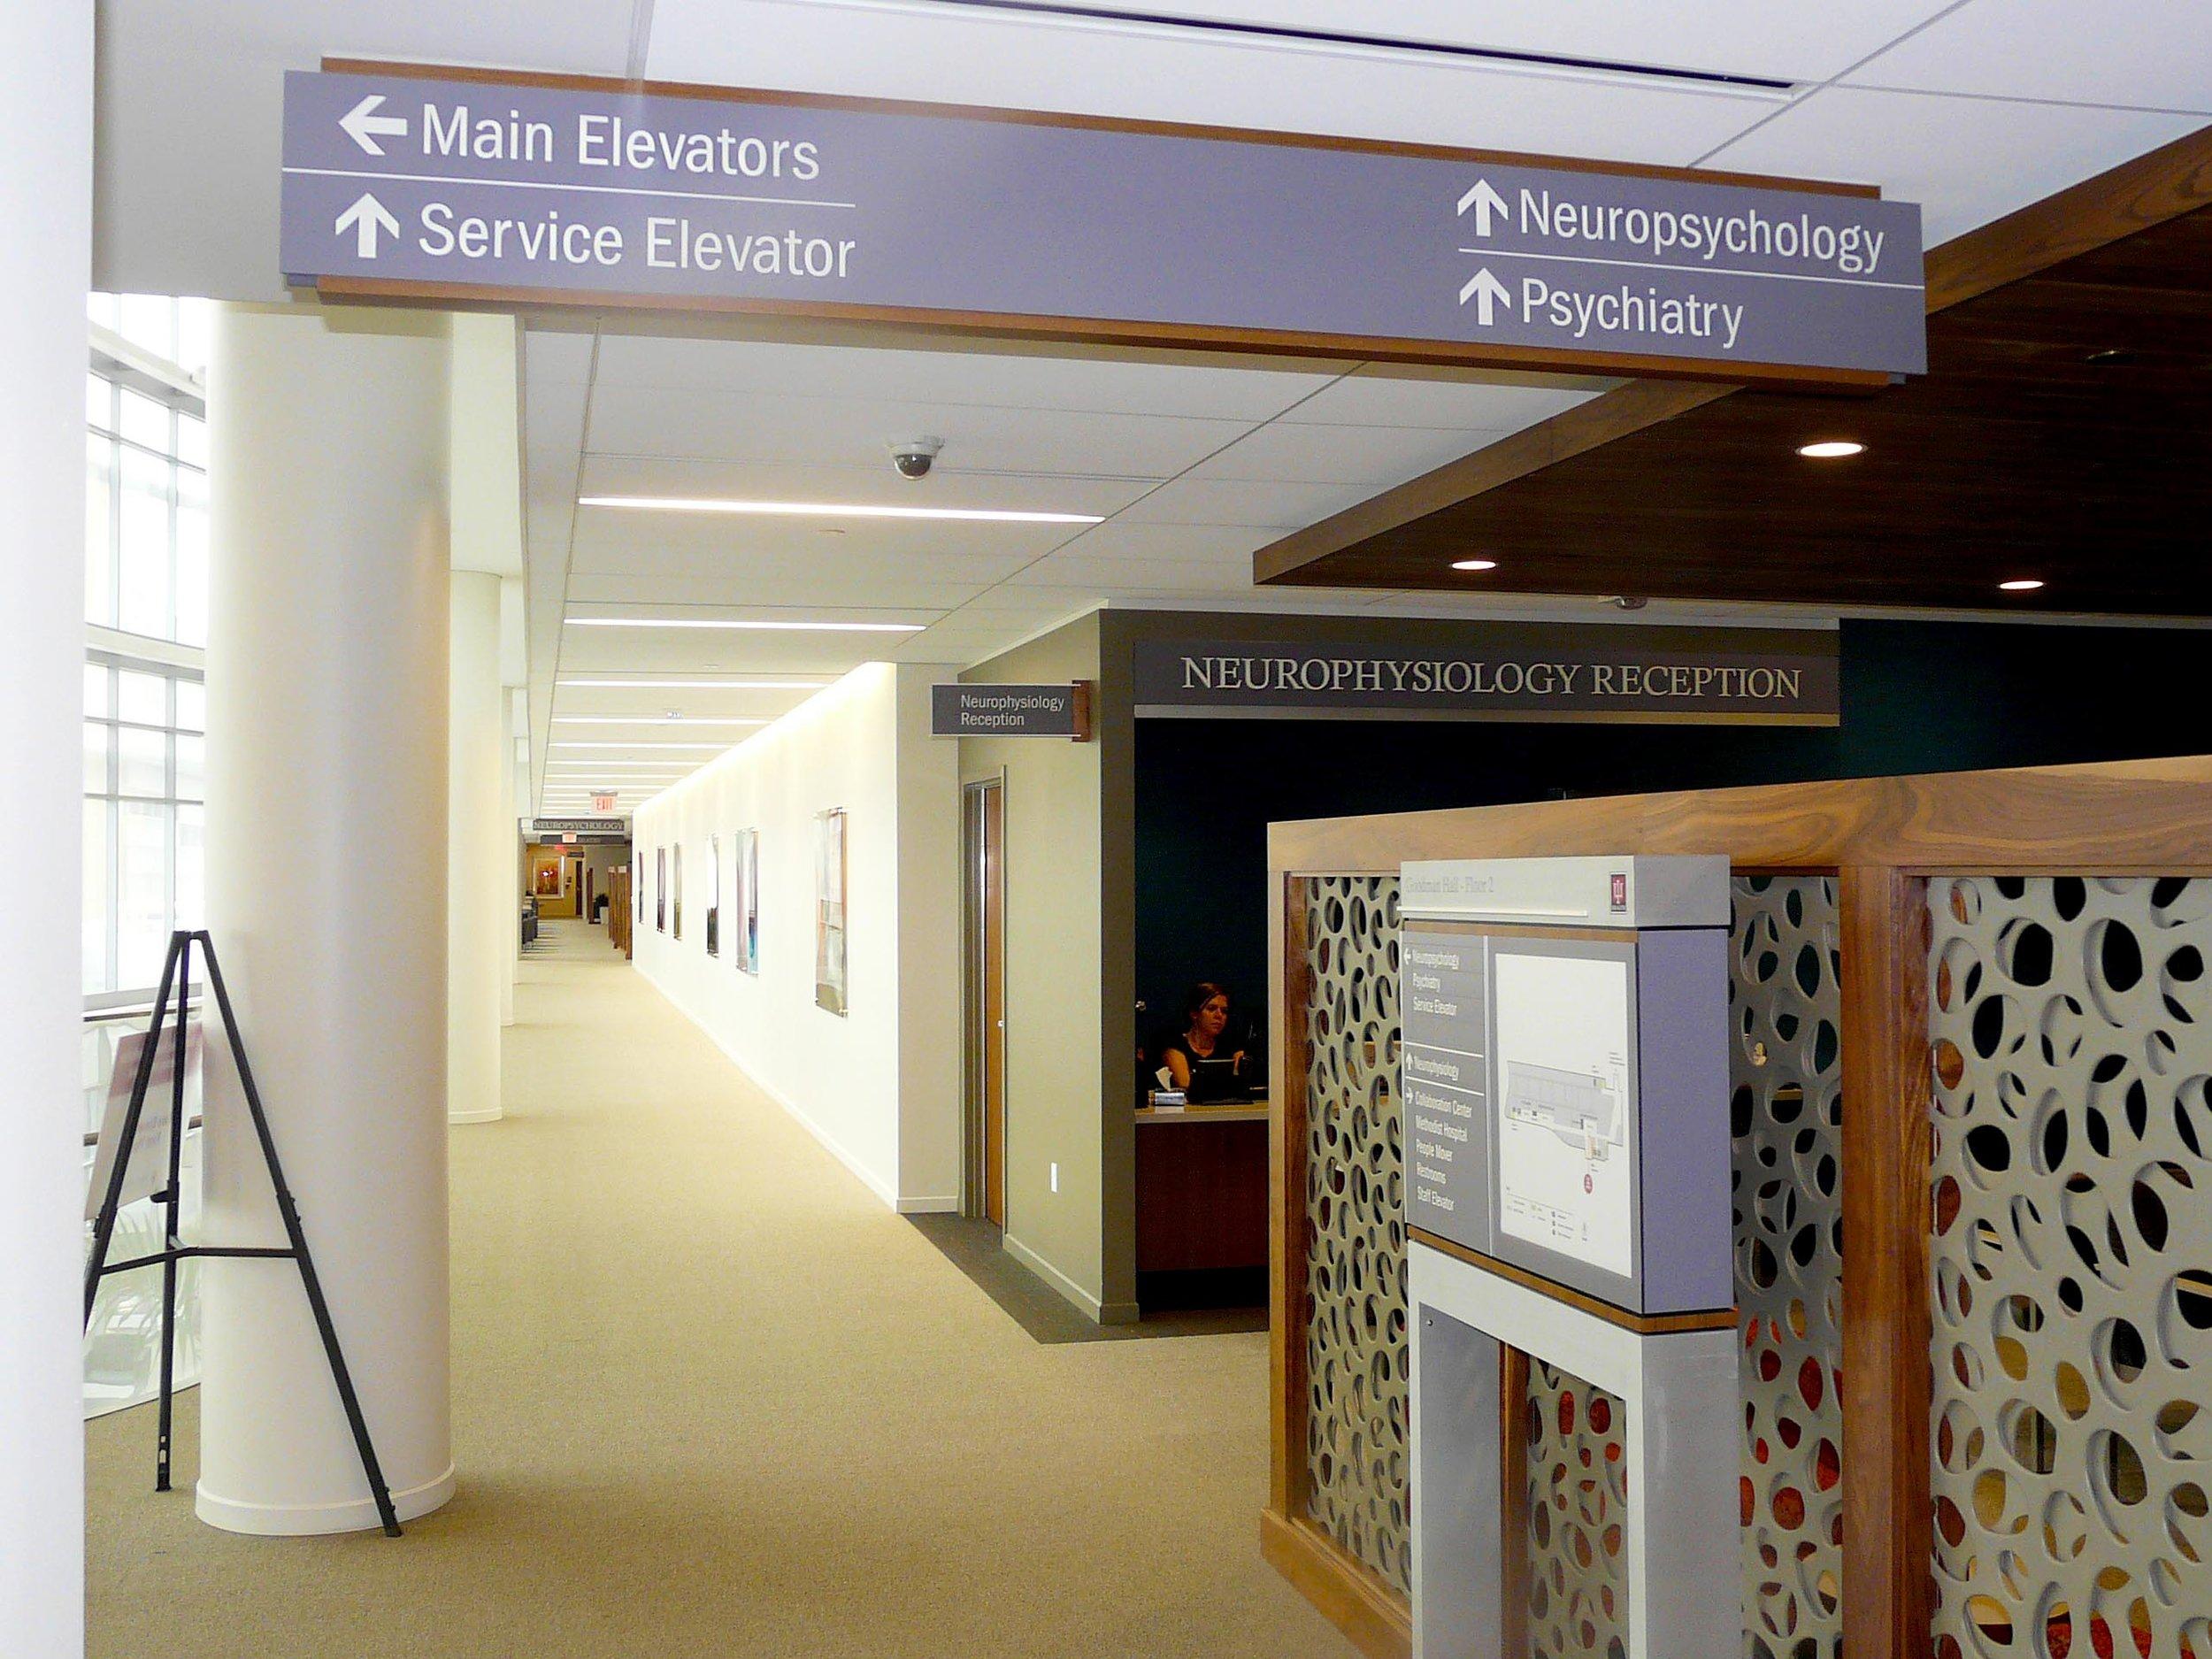 interior hospital wayfinding system.jpg